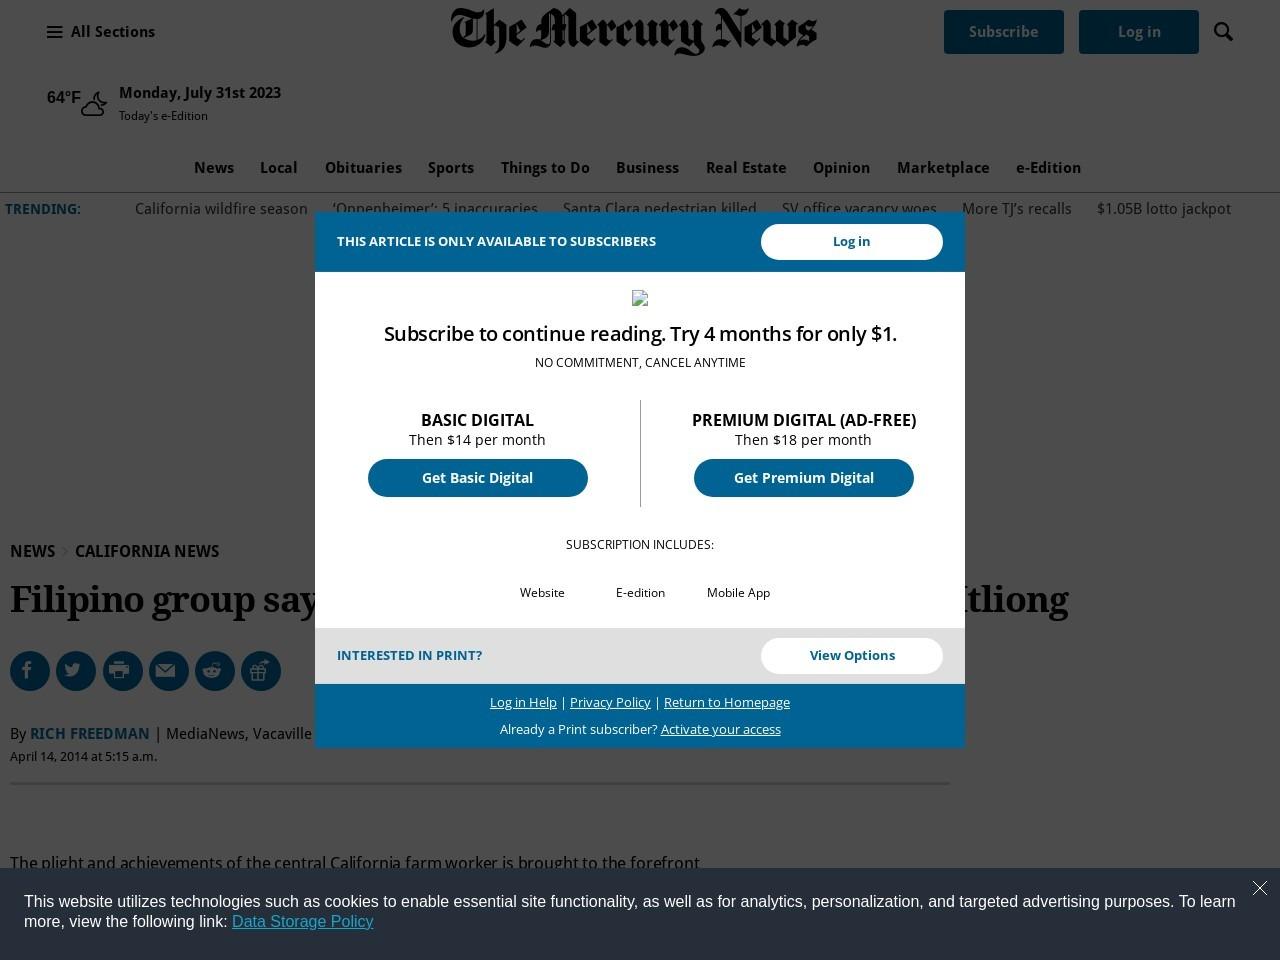 Filipino group says 'Chavez' falls fall short in crediting Itliong